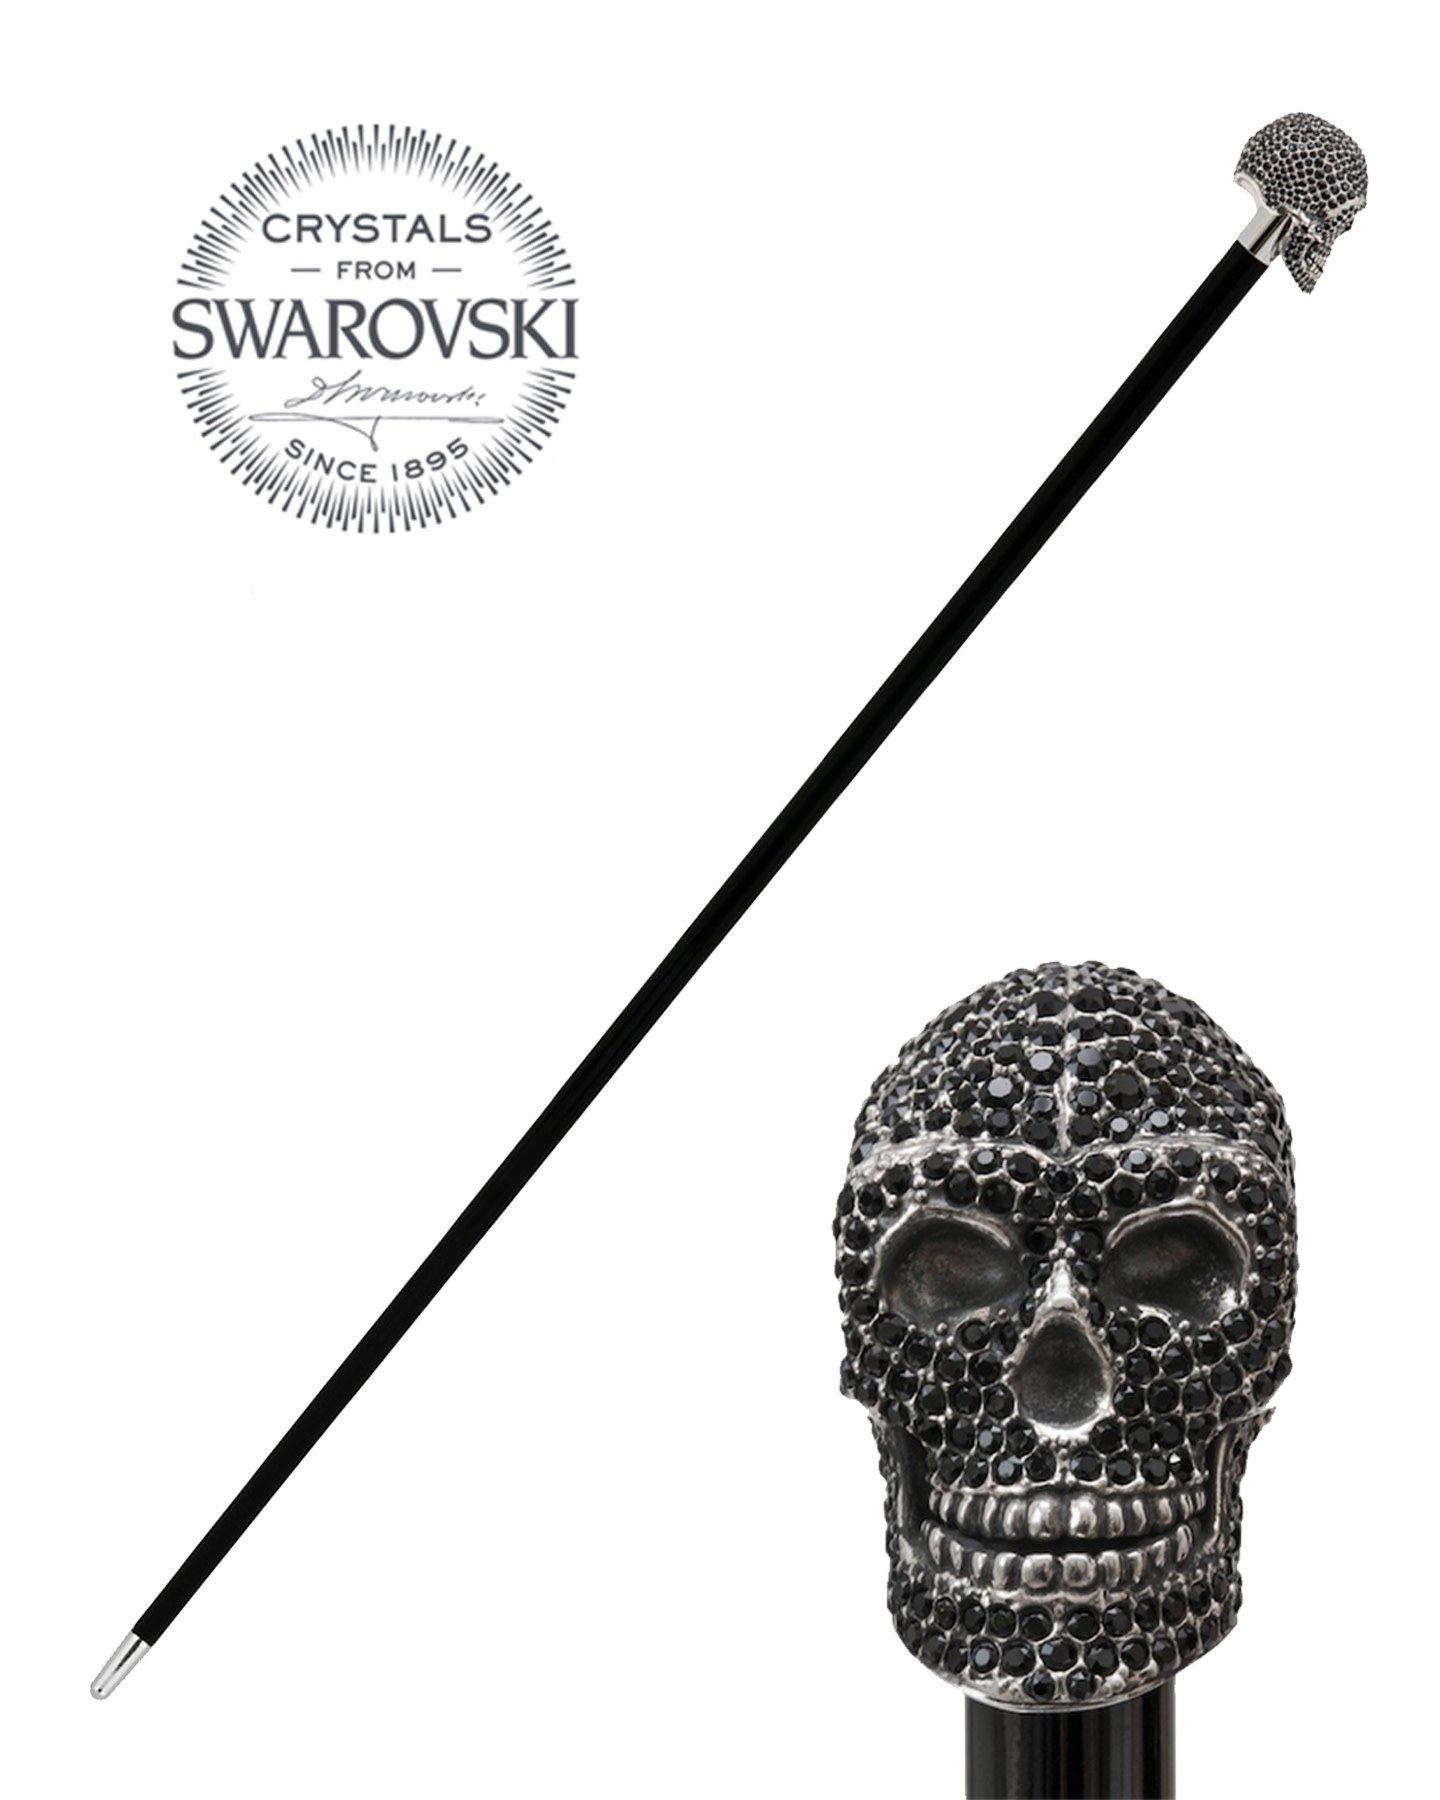 BLACK SWAROVSKI SKULL WALKING STICK